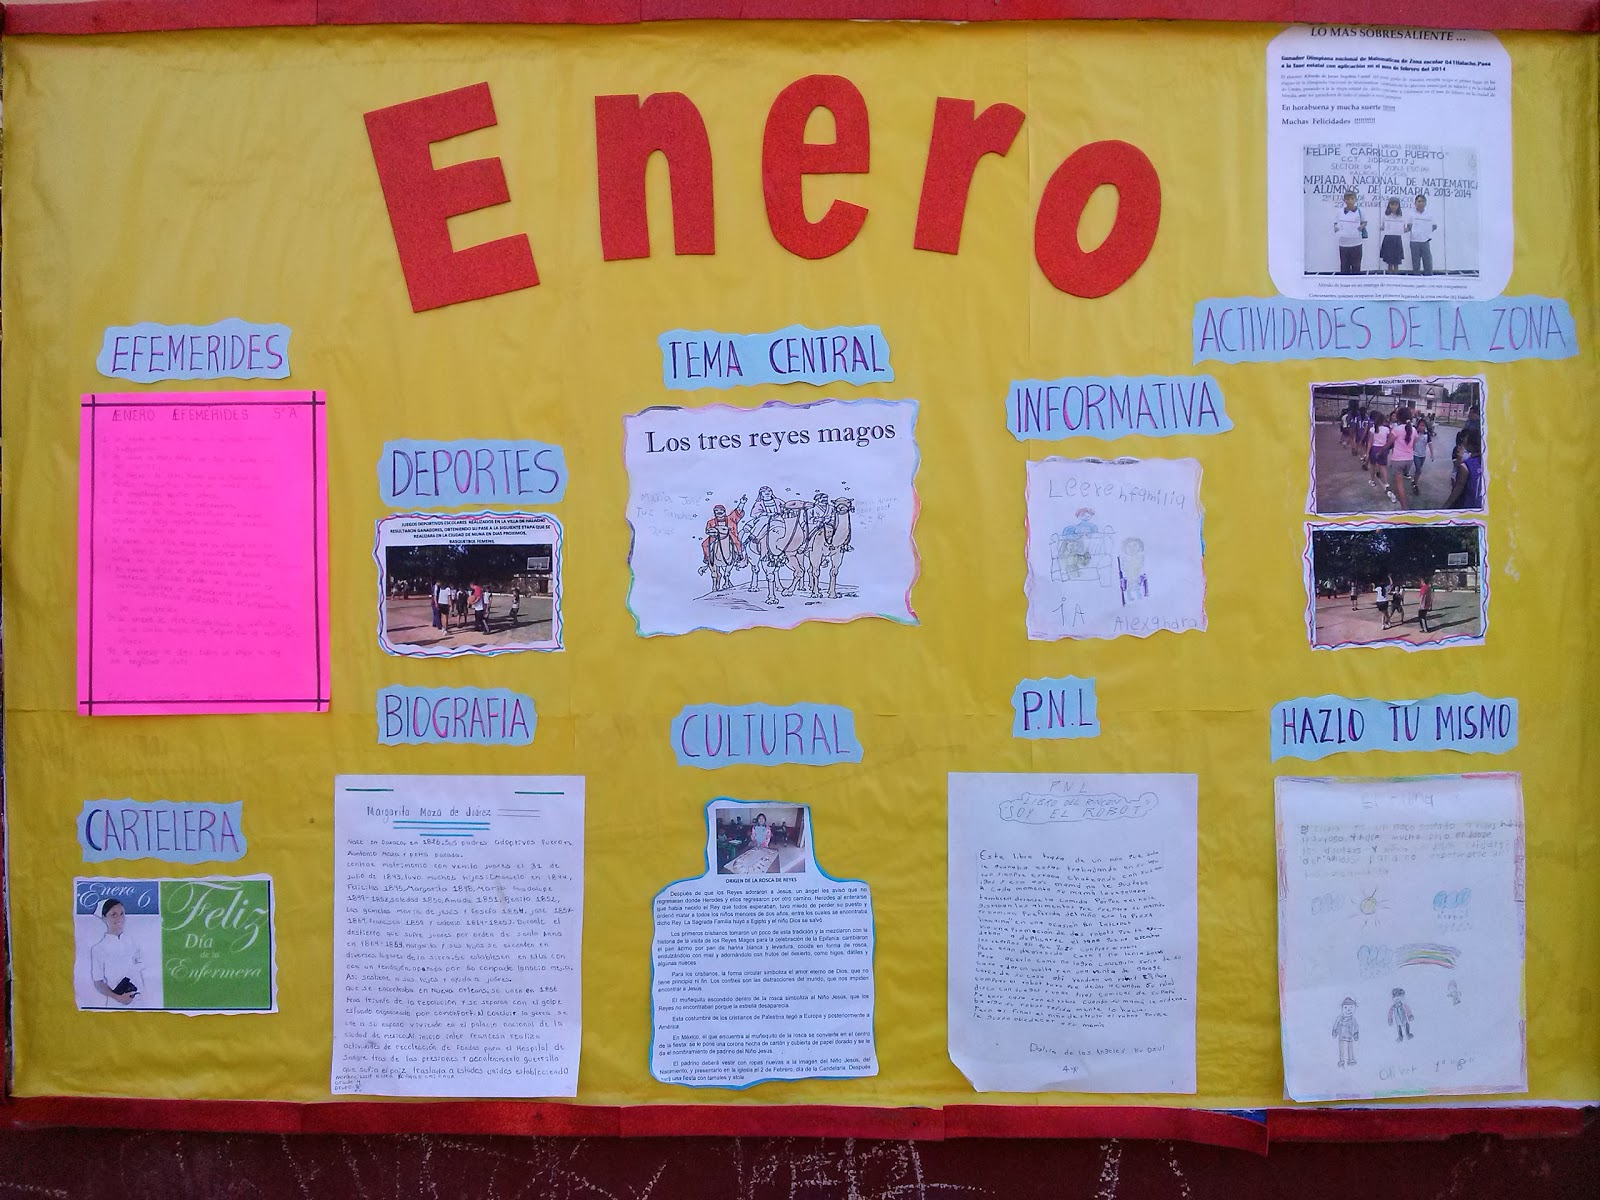 Periodico mura enero 1 imagenes educativas for Estructura de un periodico mural escolar